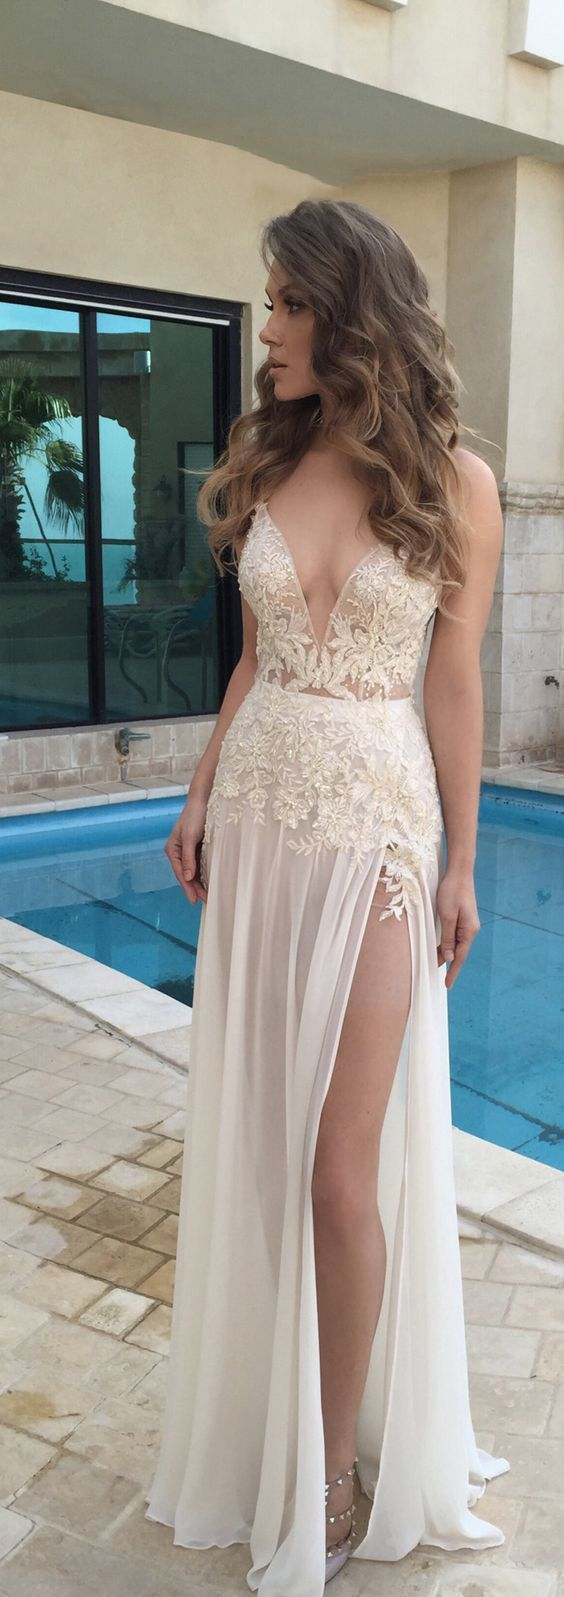 Beach wedding dresses 2018 for guest